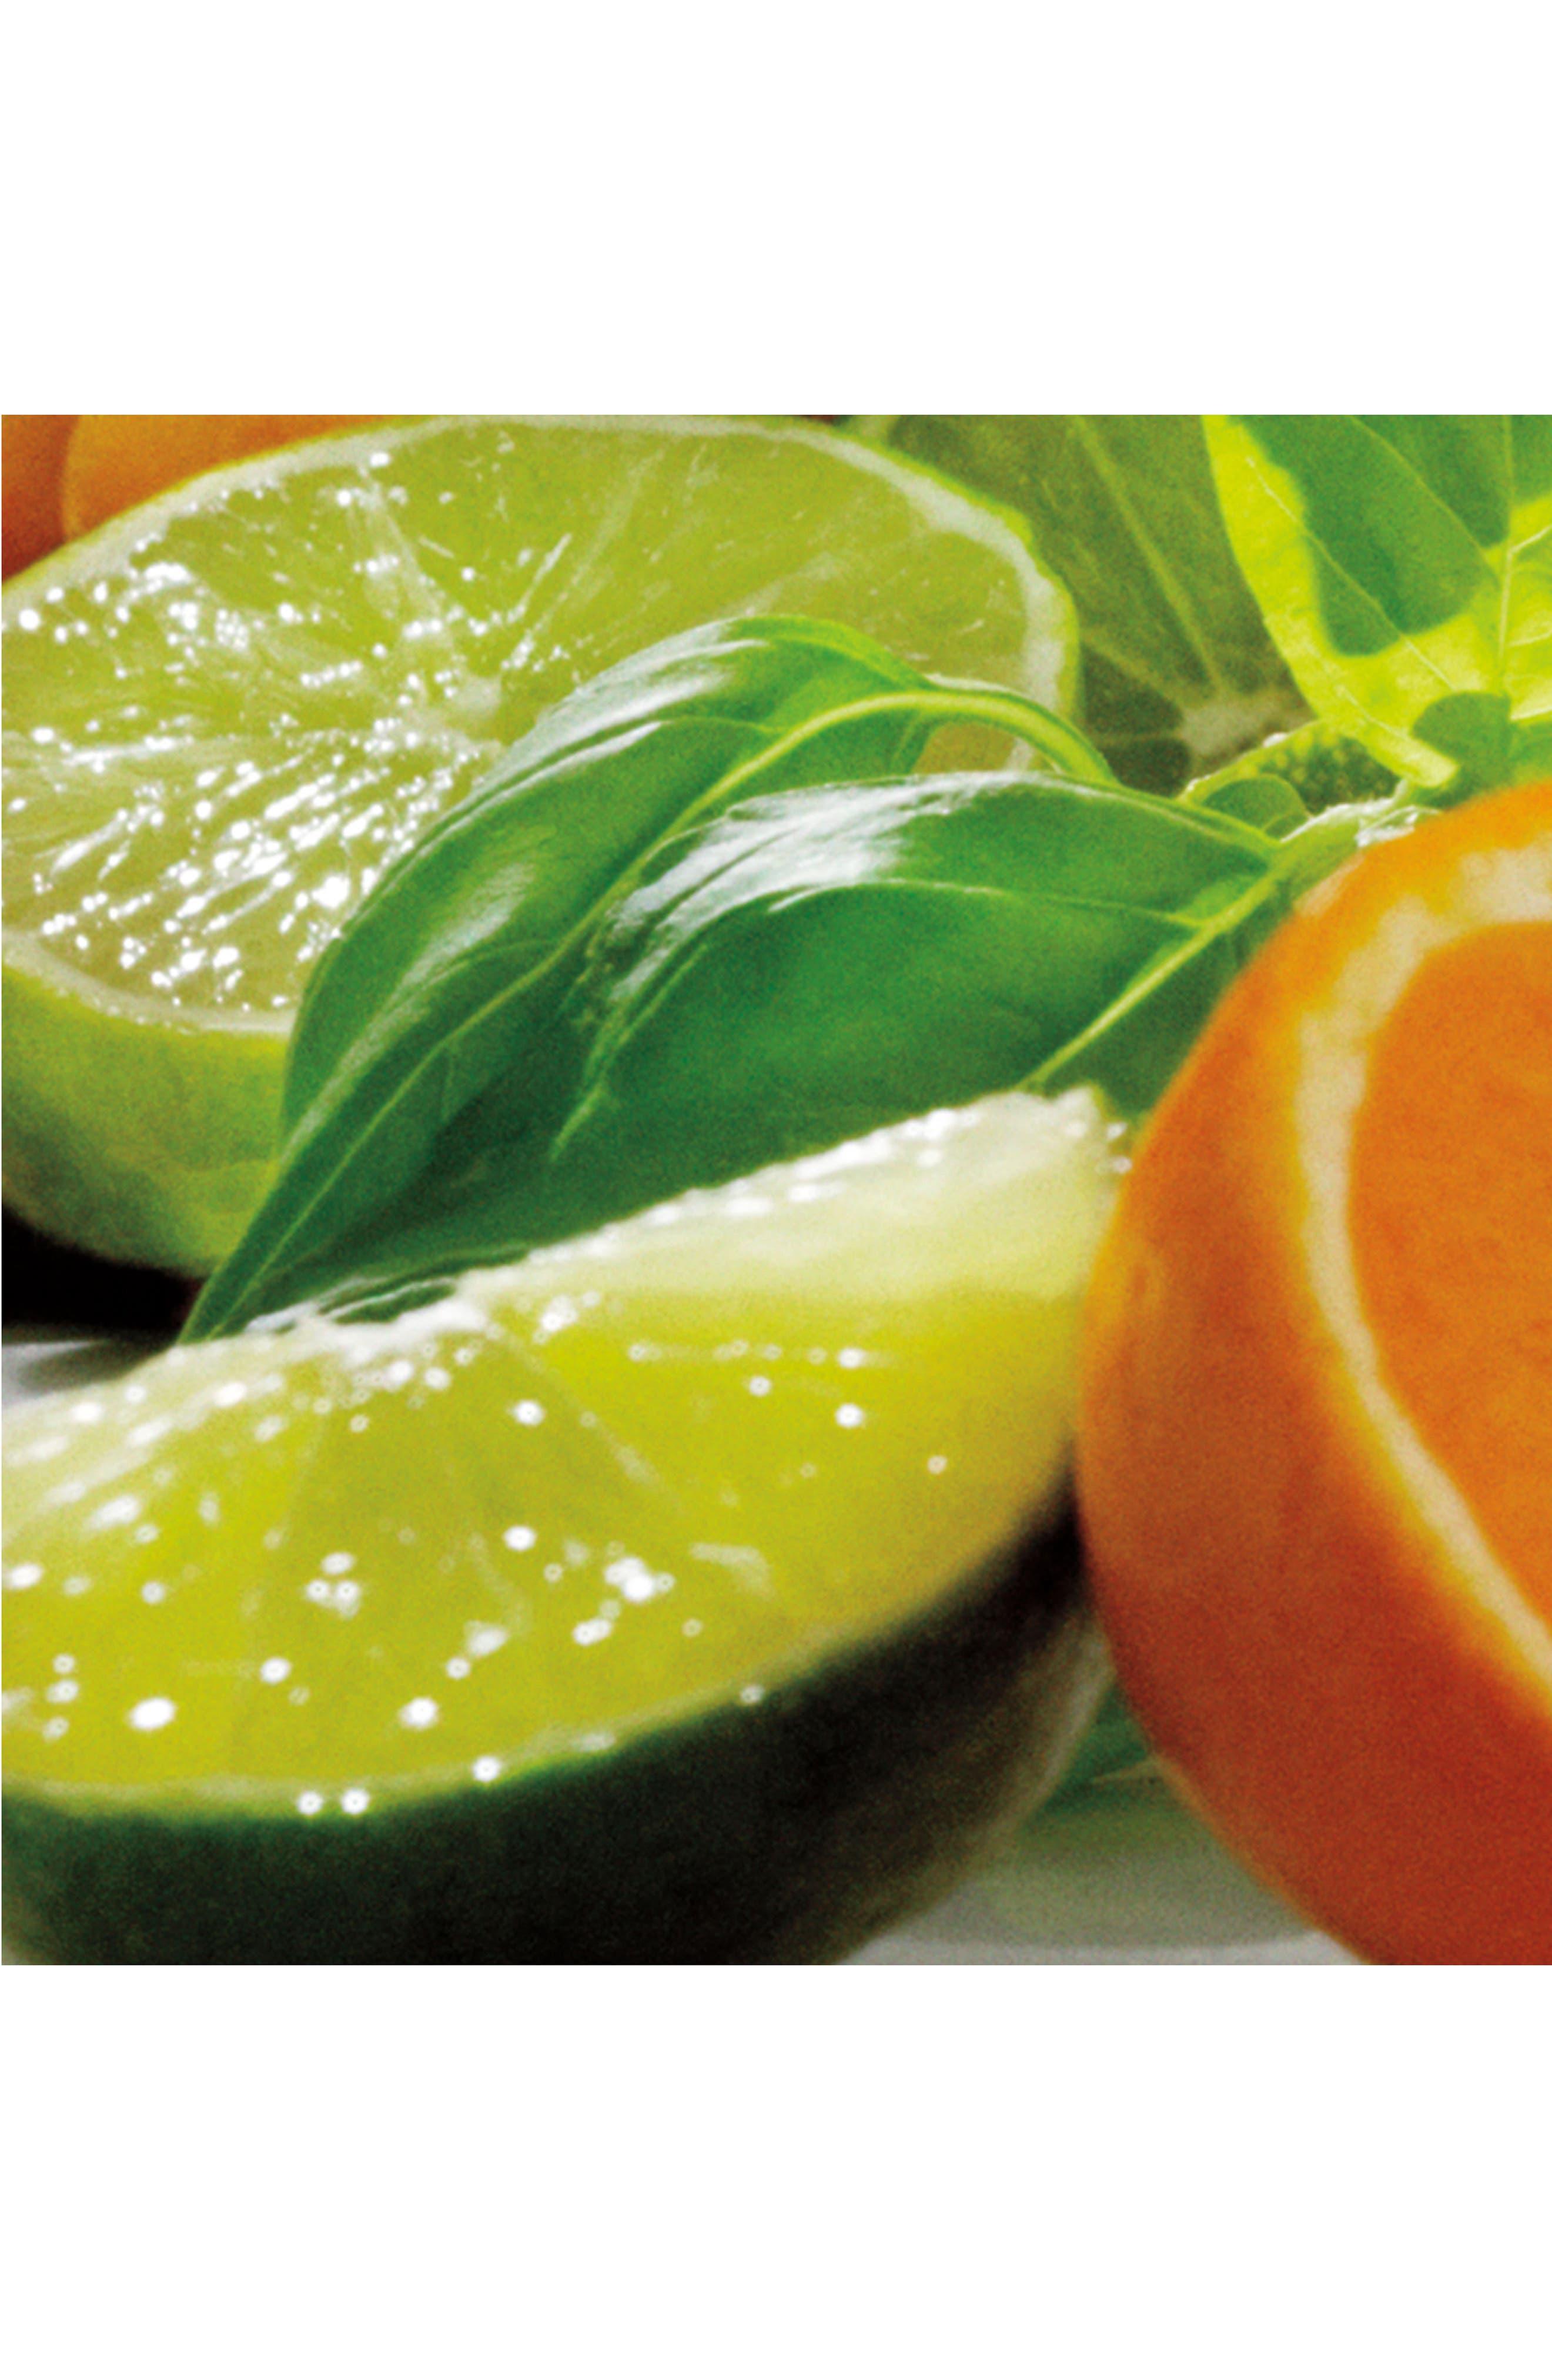 Lime Basil & Mandarin Body & Hand Lotion,                             Alternate thumbnail 3, color,                             No Color